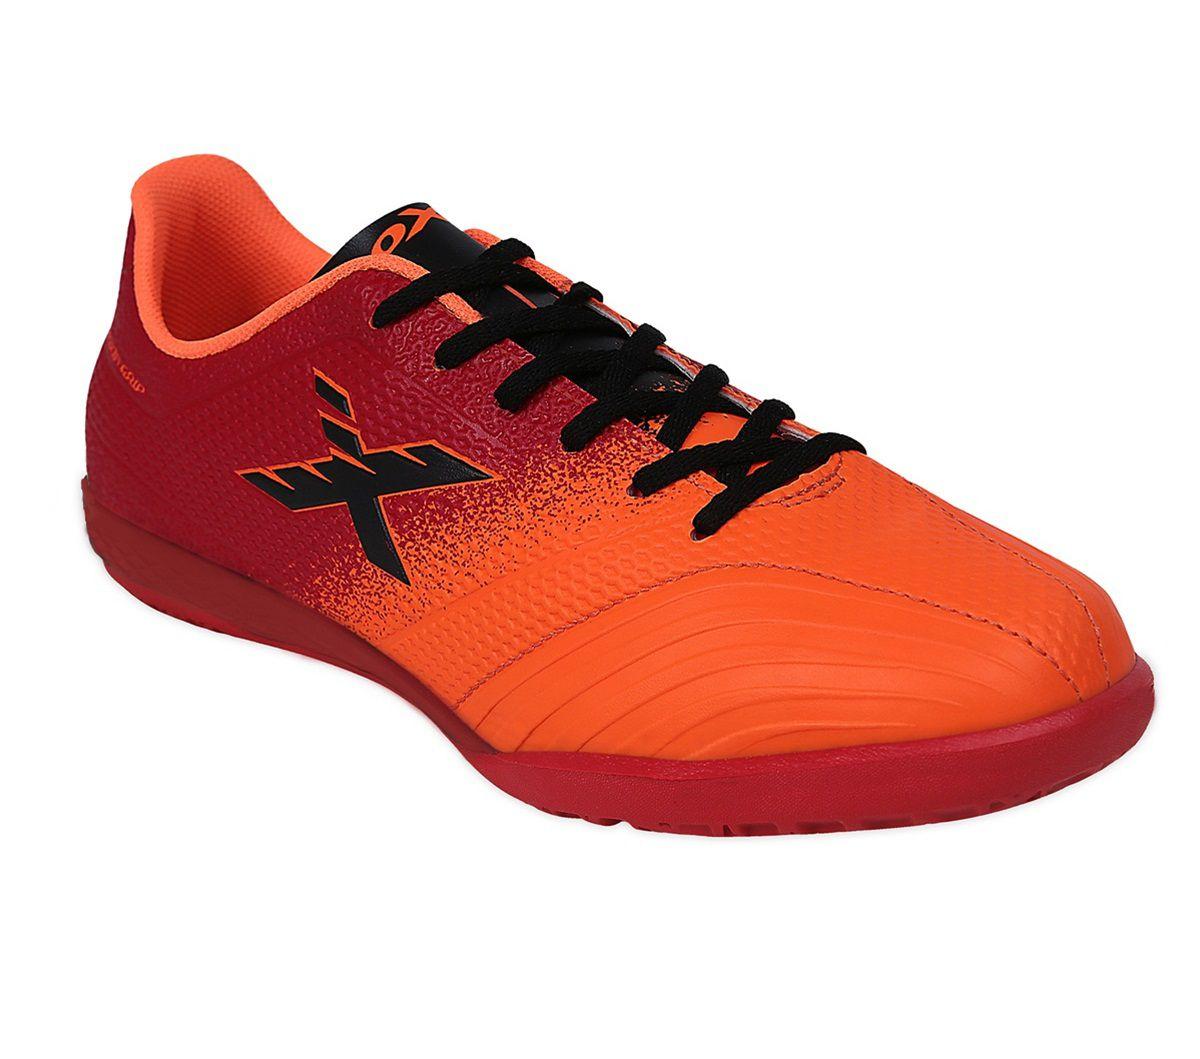 679126286305e Tenis Futsal Oxn Fusion Grip 2 Infantil - SPORT CENTER JARAGUÁ